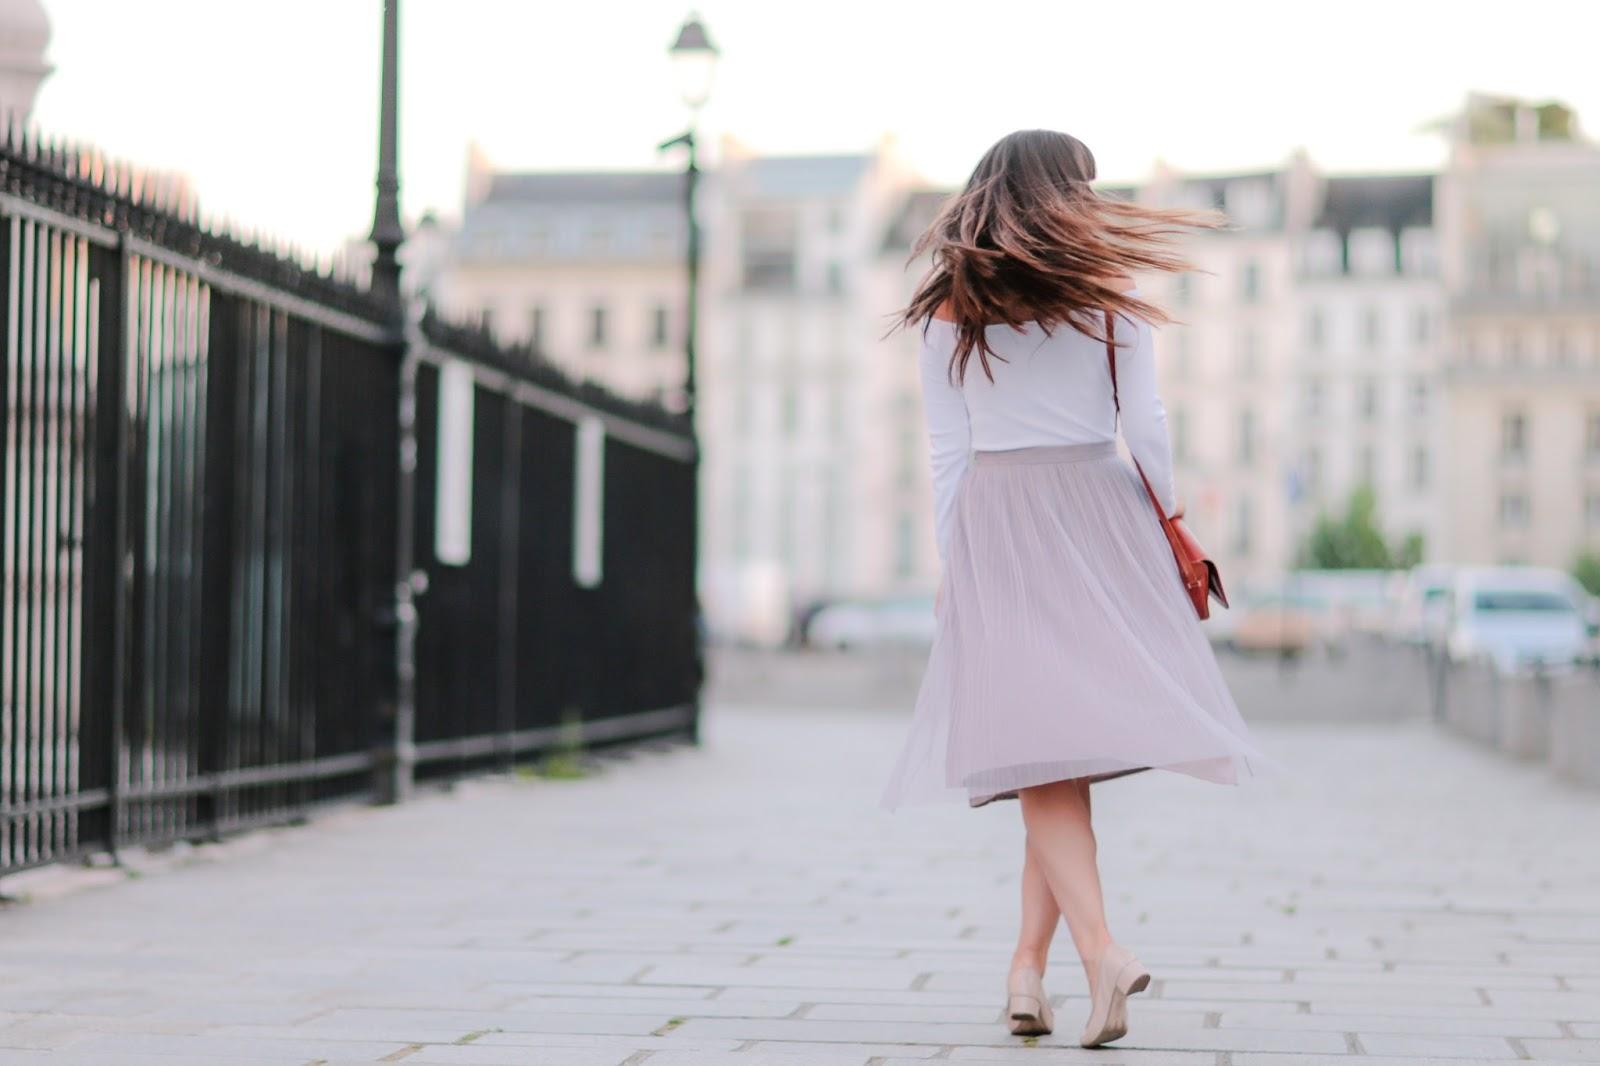 parisian fashion blogger, look, style, meetmeinparee, chic parisian style, off the shoulder top, asos , boohoo